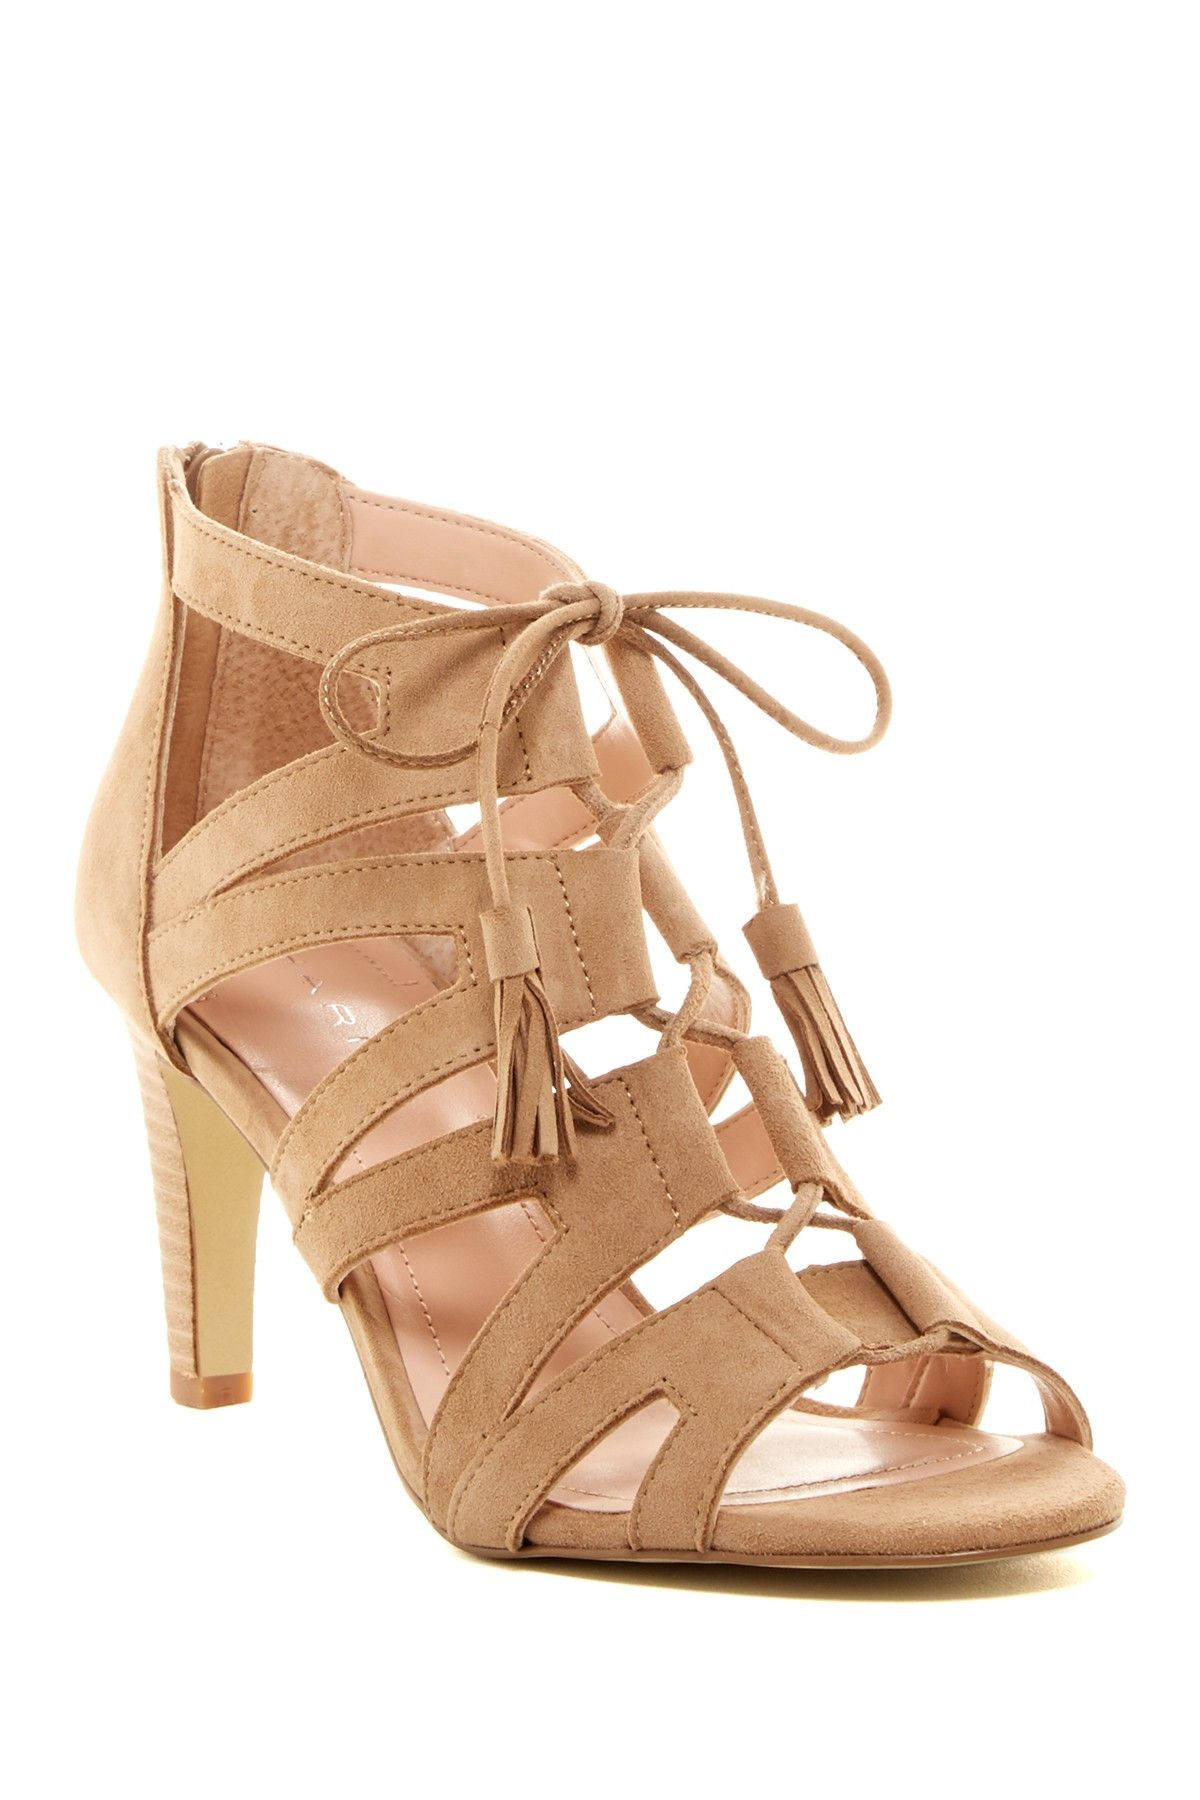 72a994b87209 Spring sandals. Tahari Luck Sandal.